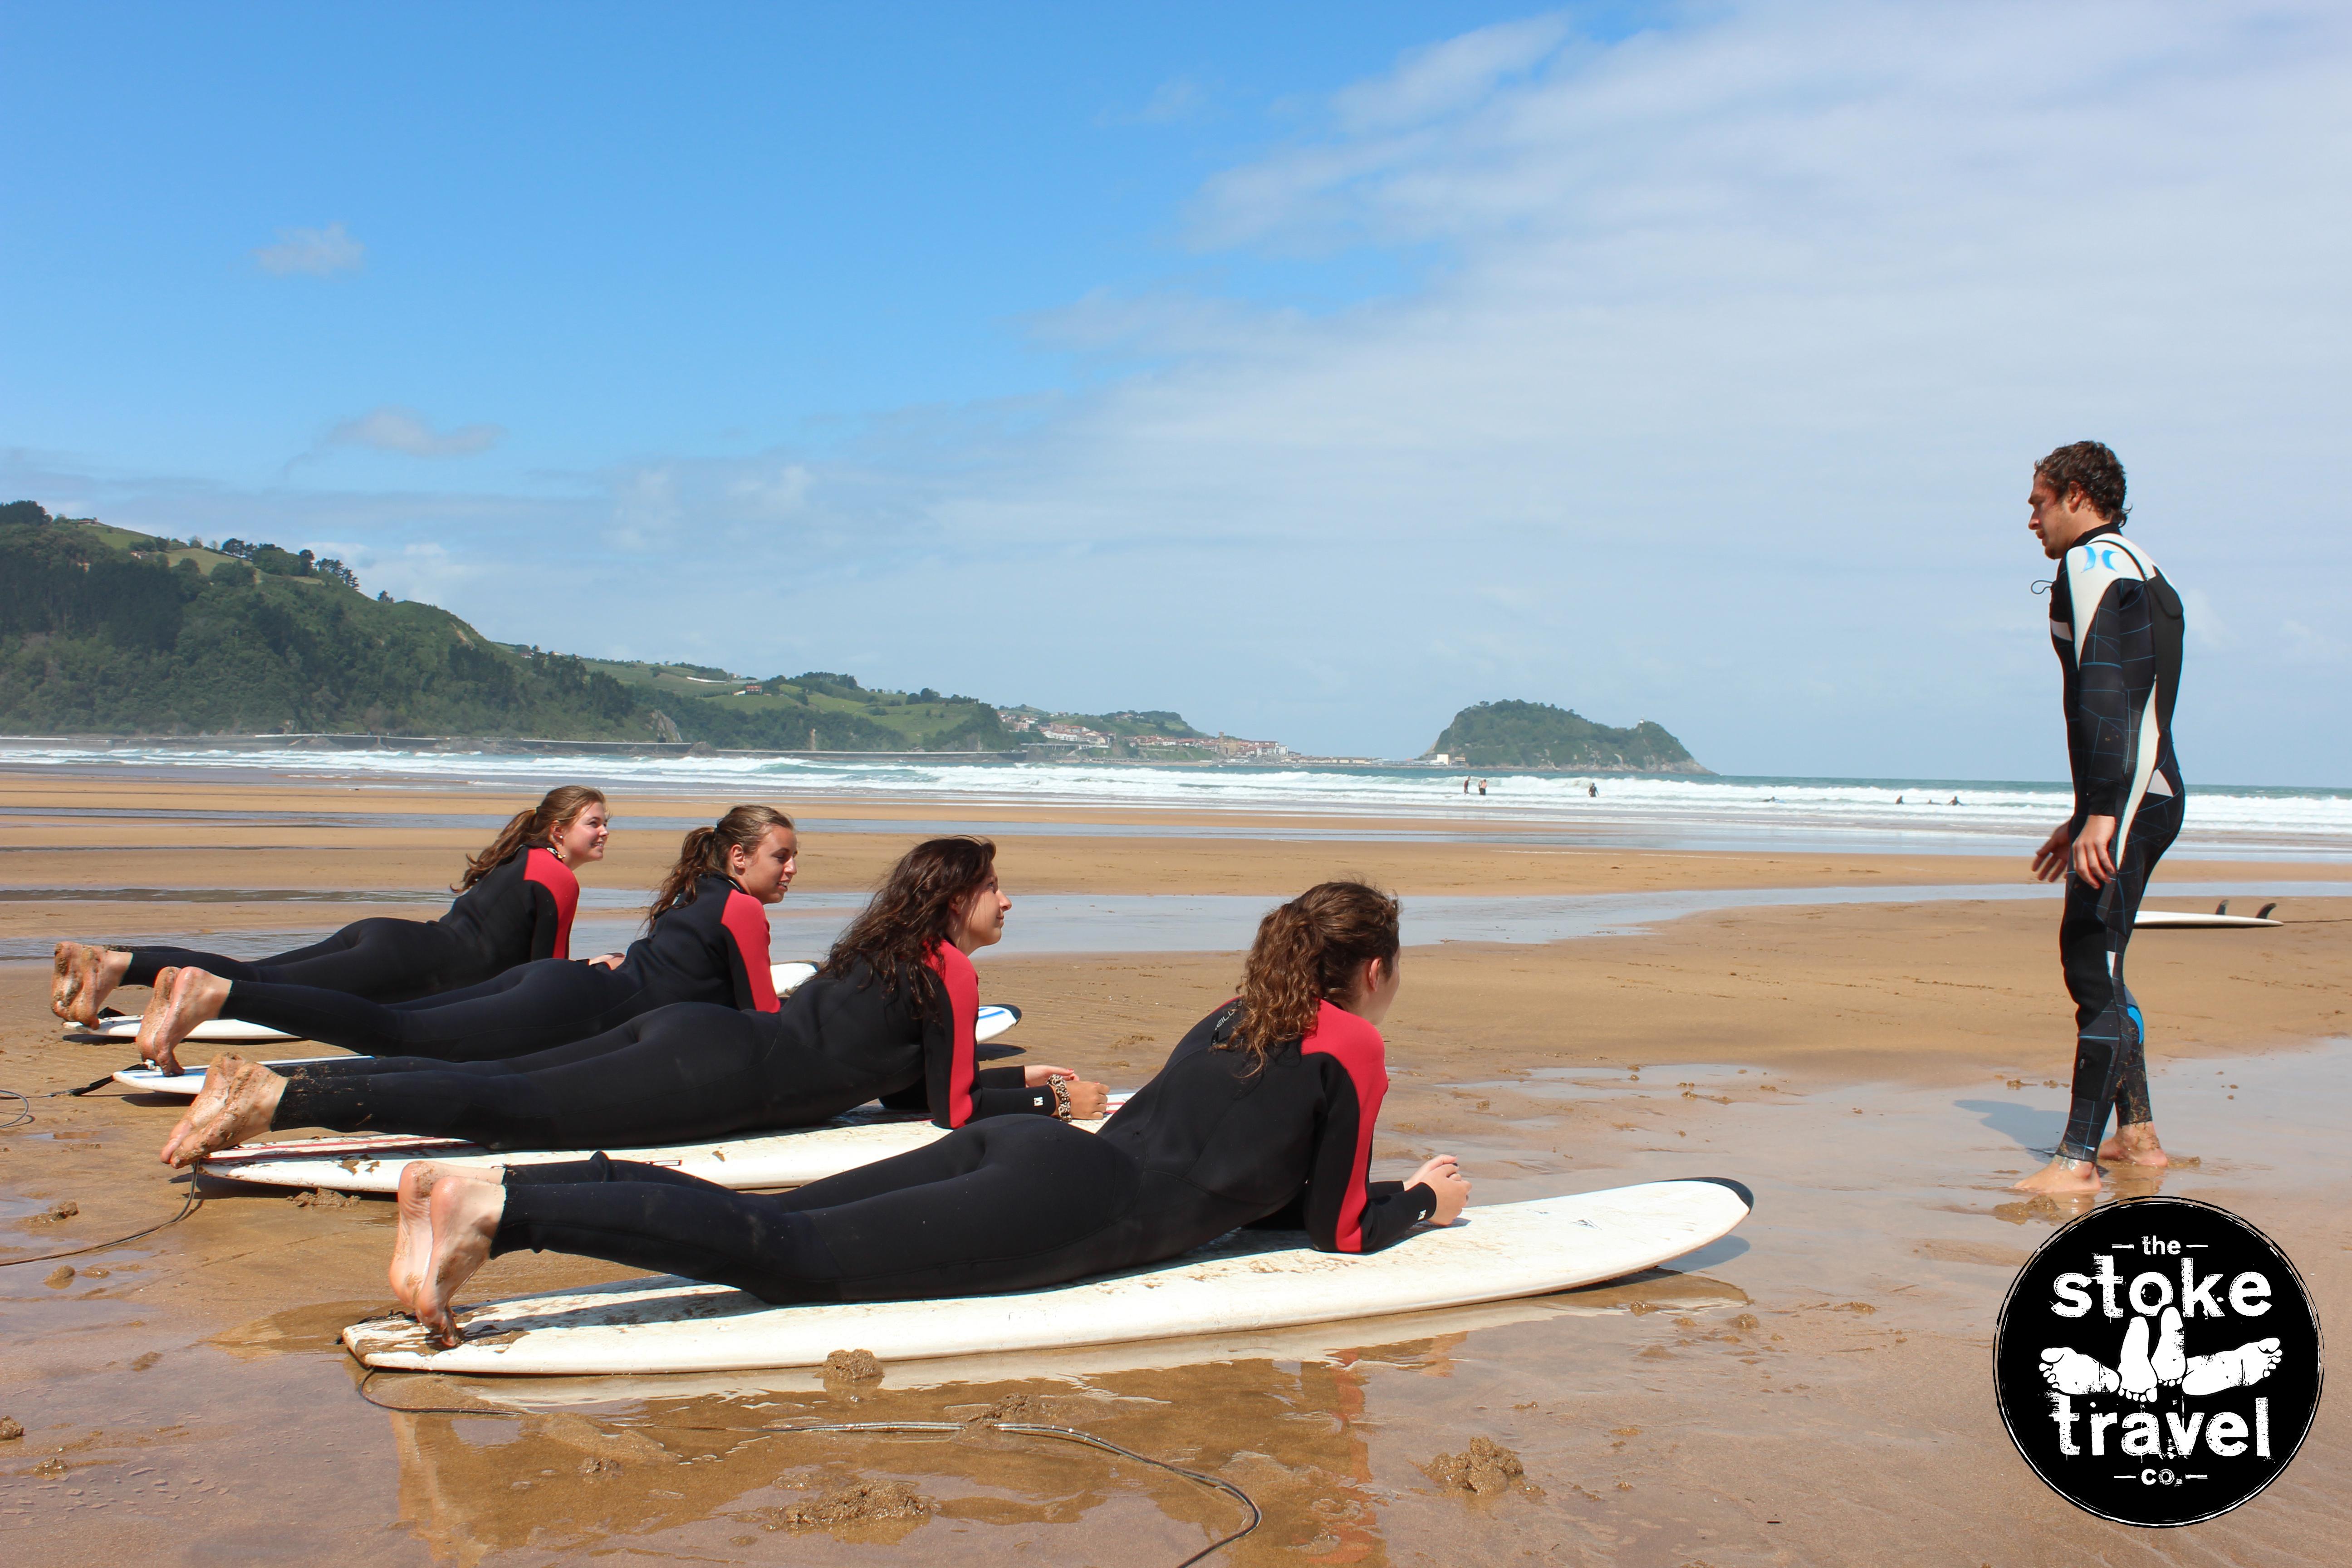 Get Stoked For Summer at San Sebastian Surf Camp